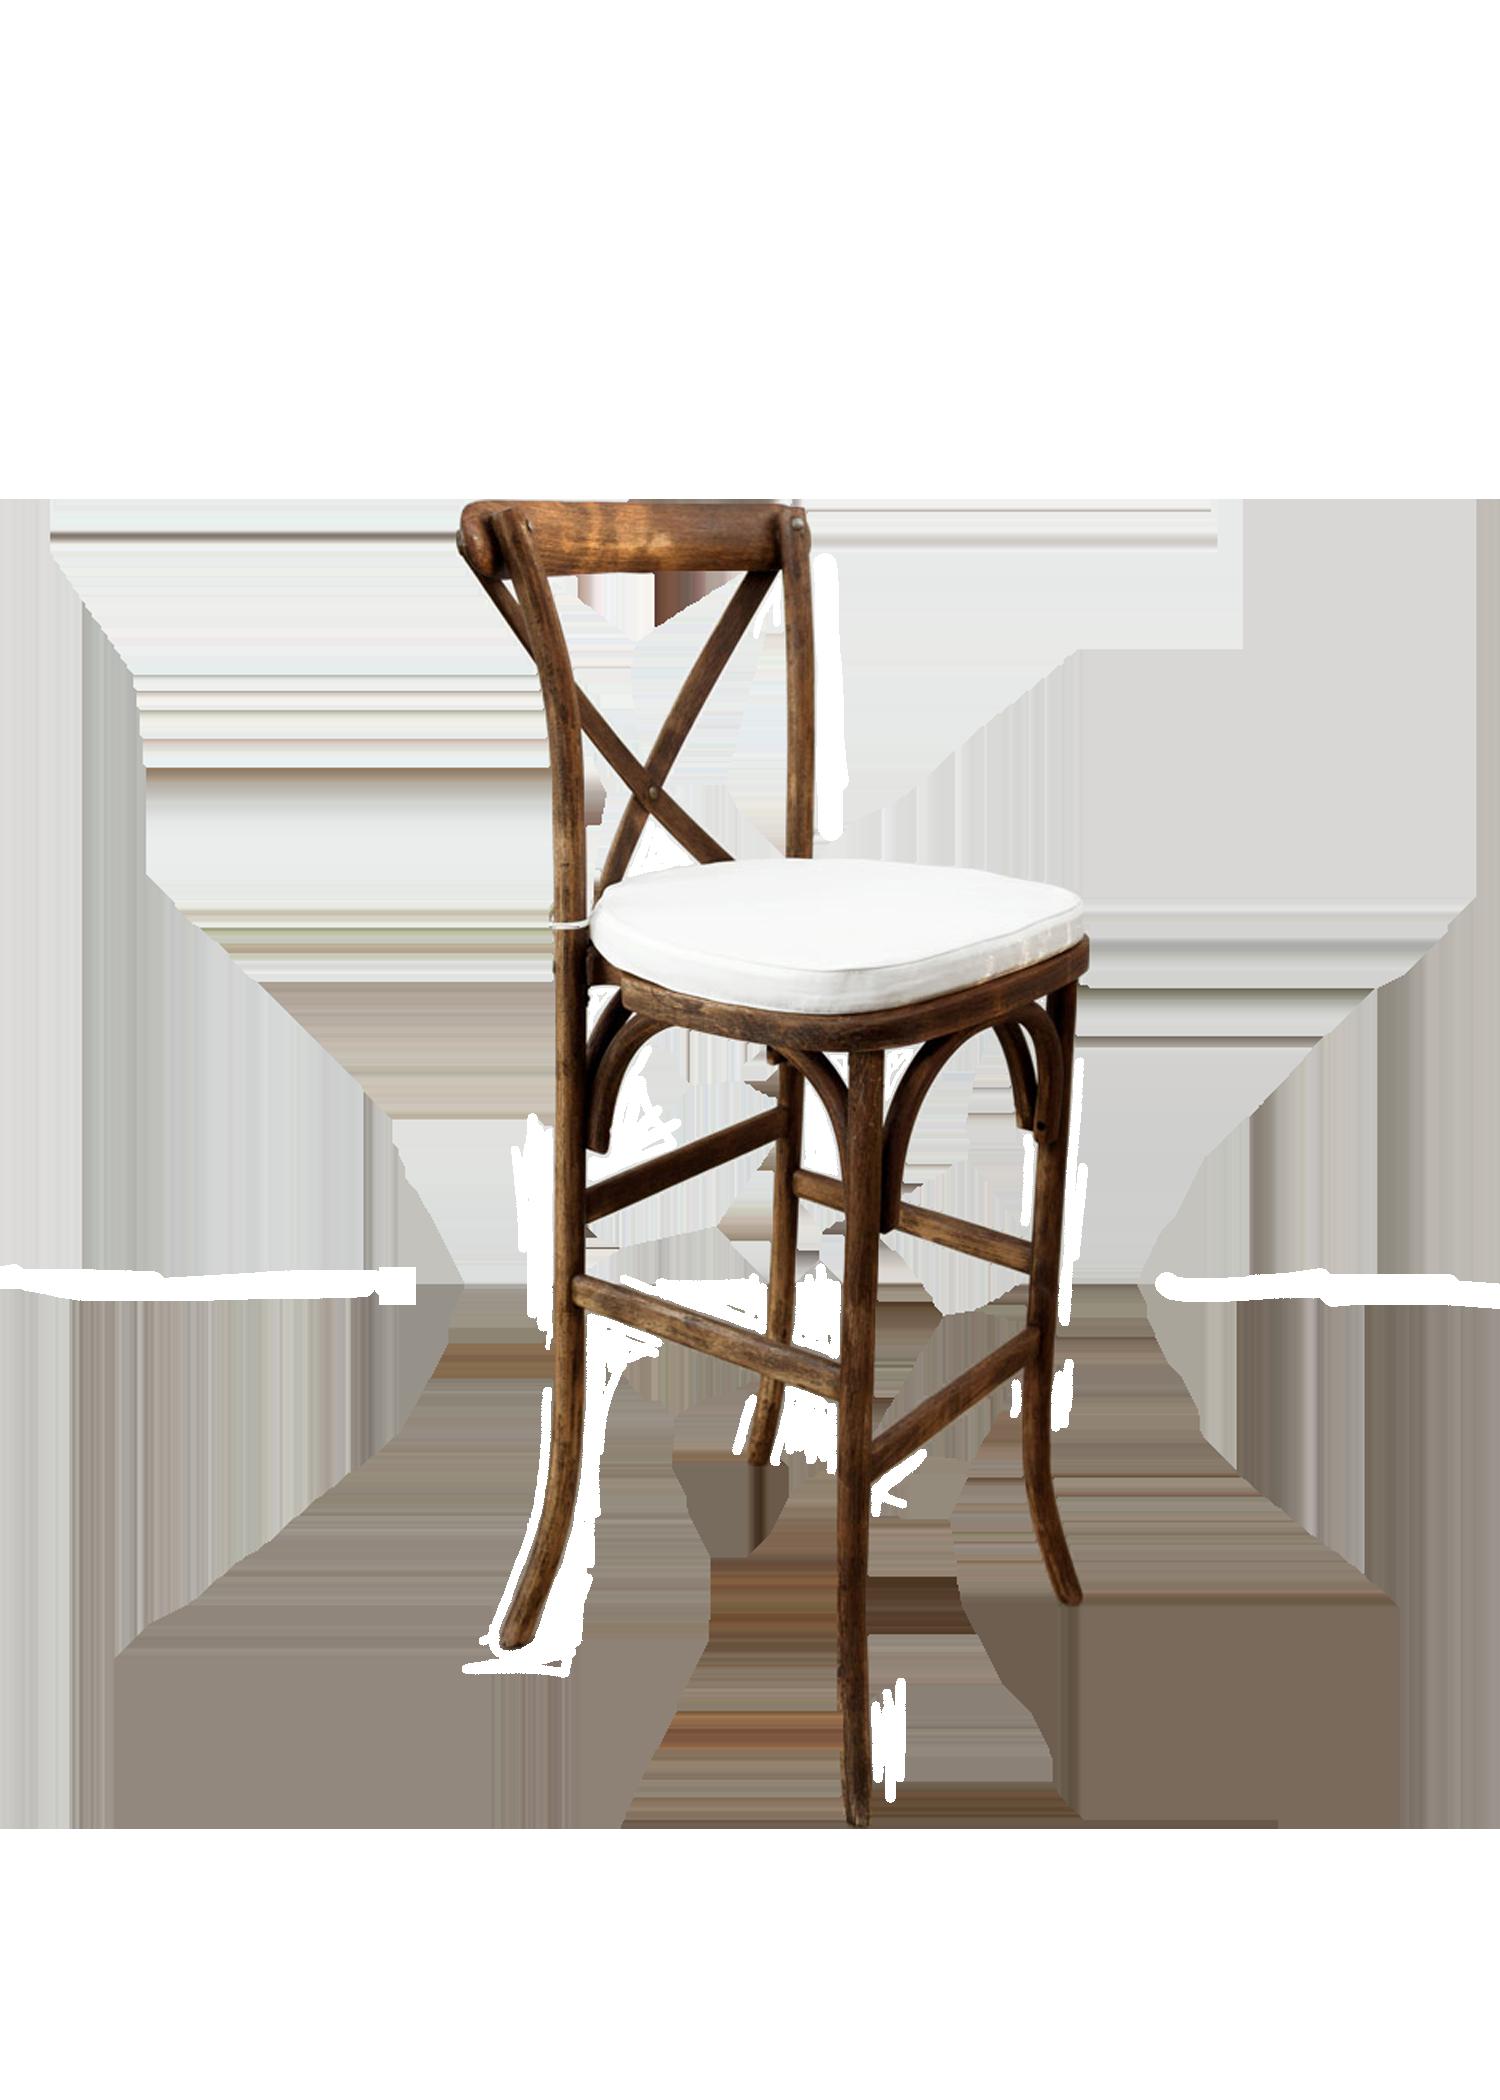 Mahogany High Cross-Back Chair